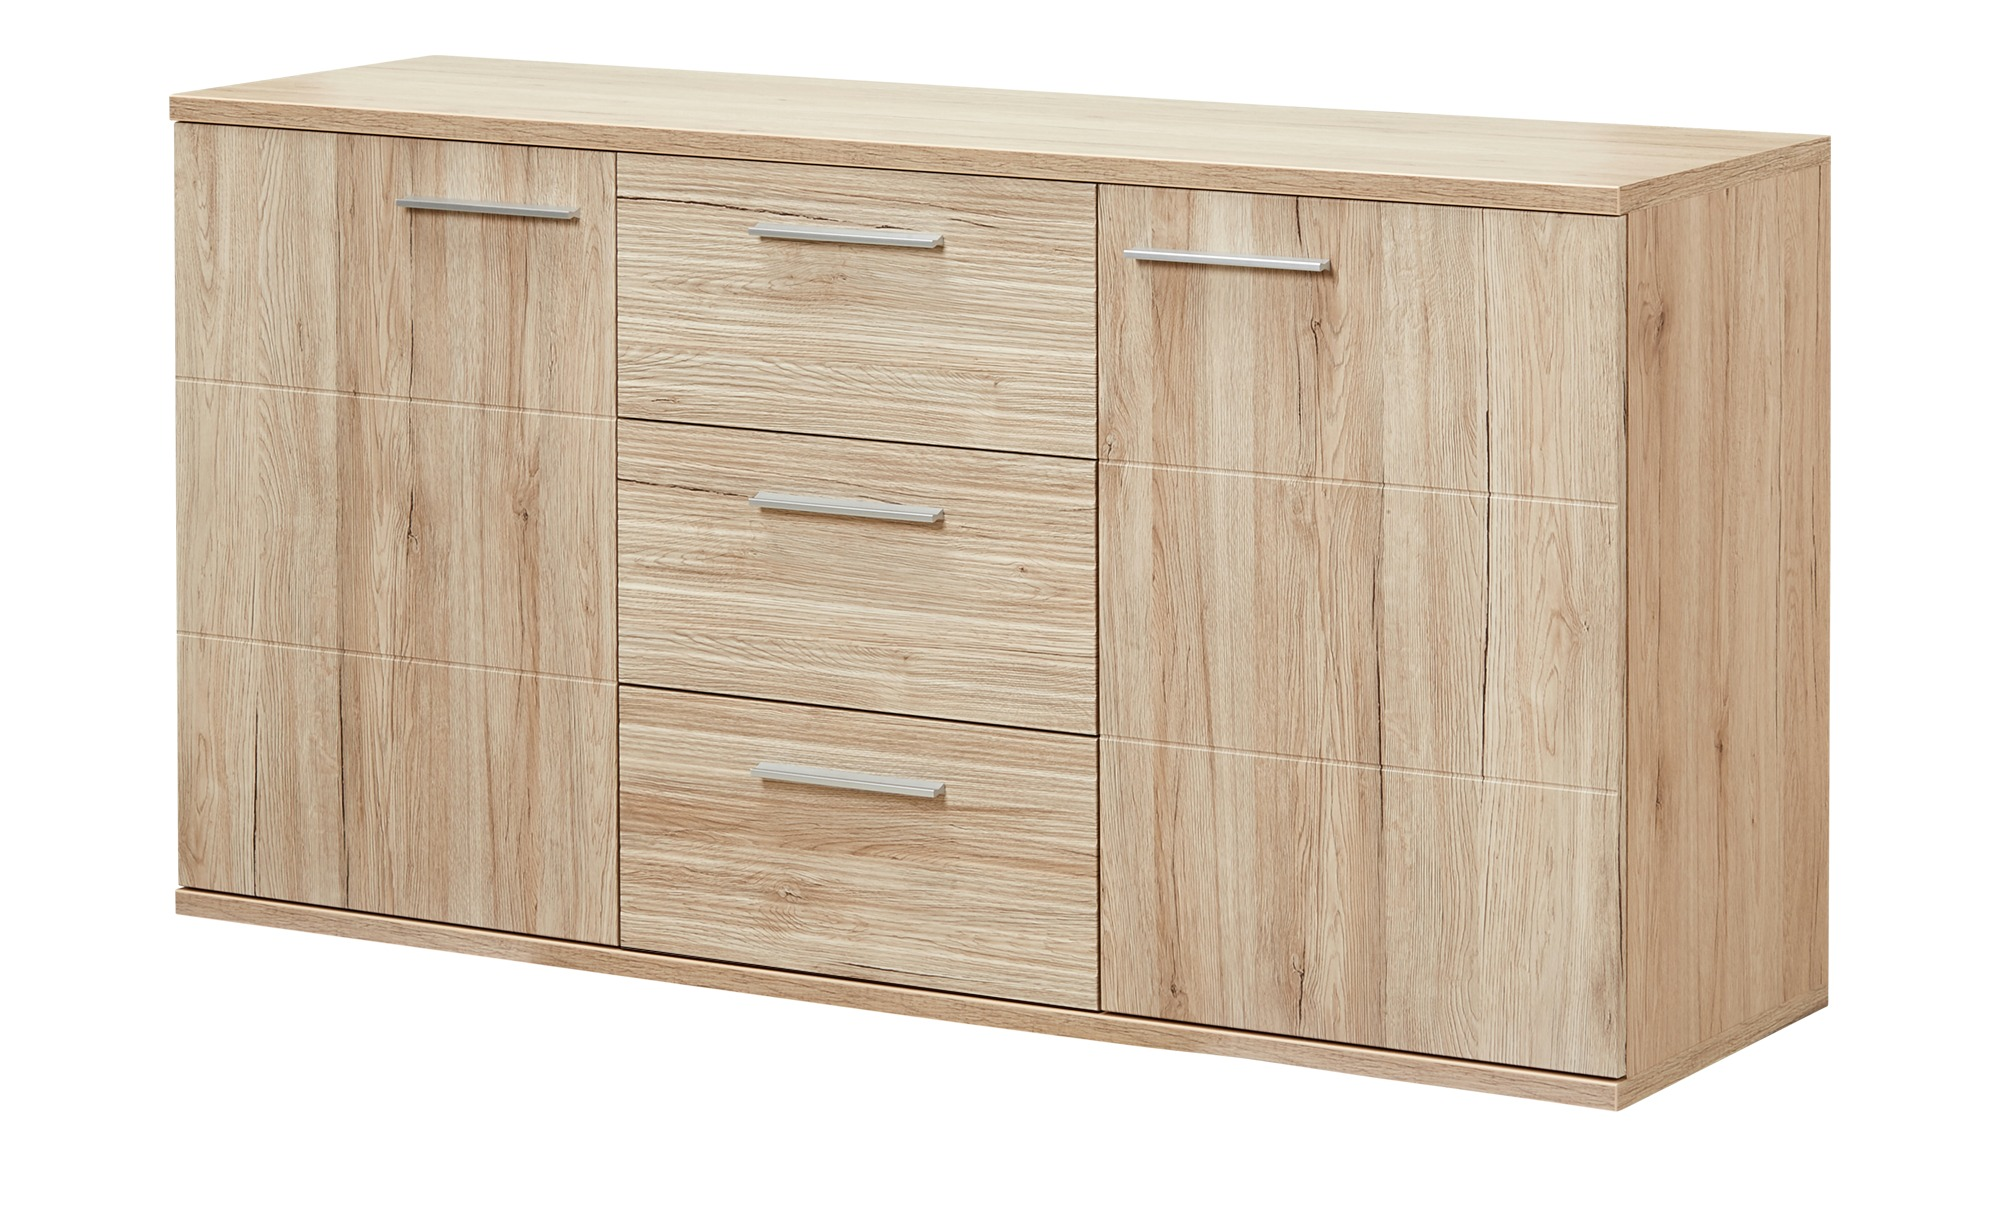 uno Sideboard  Salino ¦ holzfarben ¦ Maße (cm): B: 157,5 H: 81,7 T: 46 Kommoden & Sideboards > Sideboards - Höffner